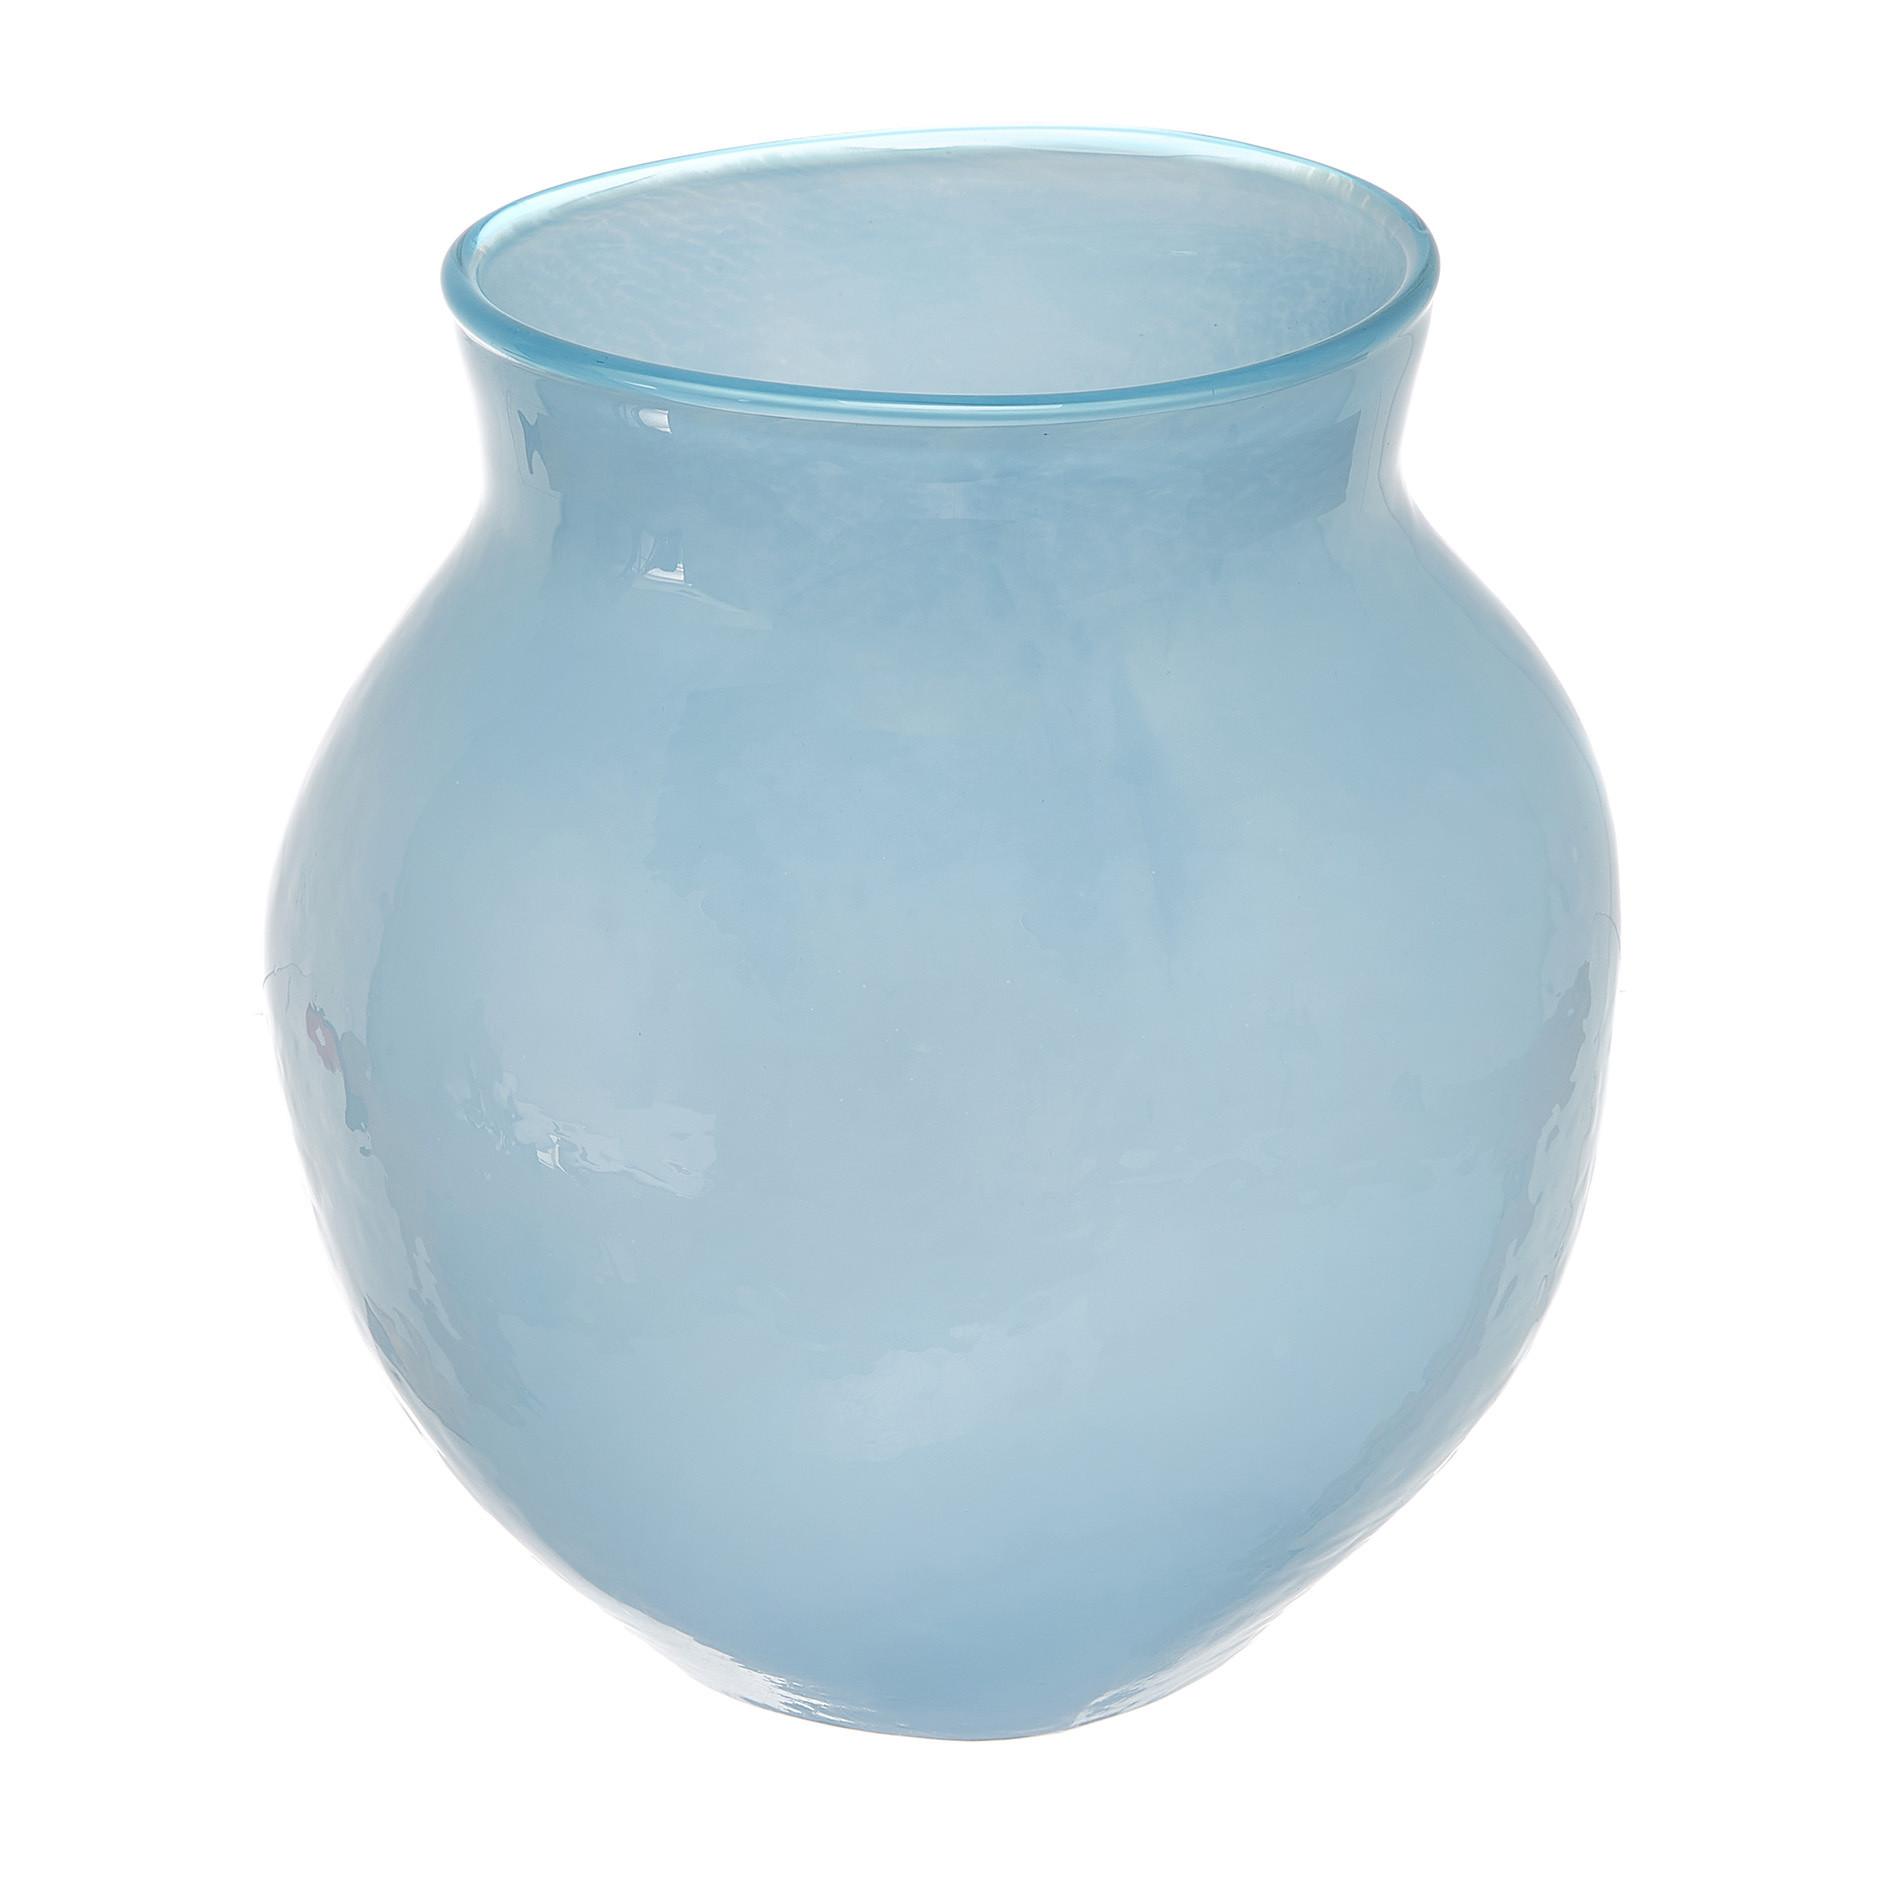 Vaso vetro colorato in pasta, Azzurro, large image number 0